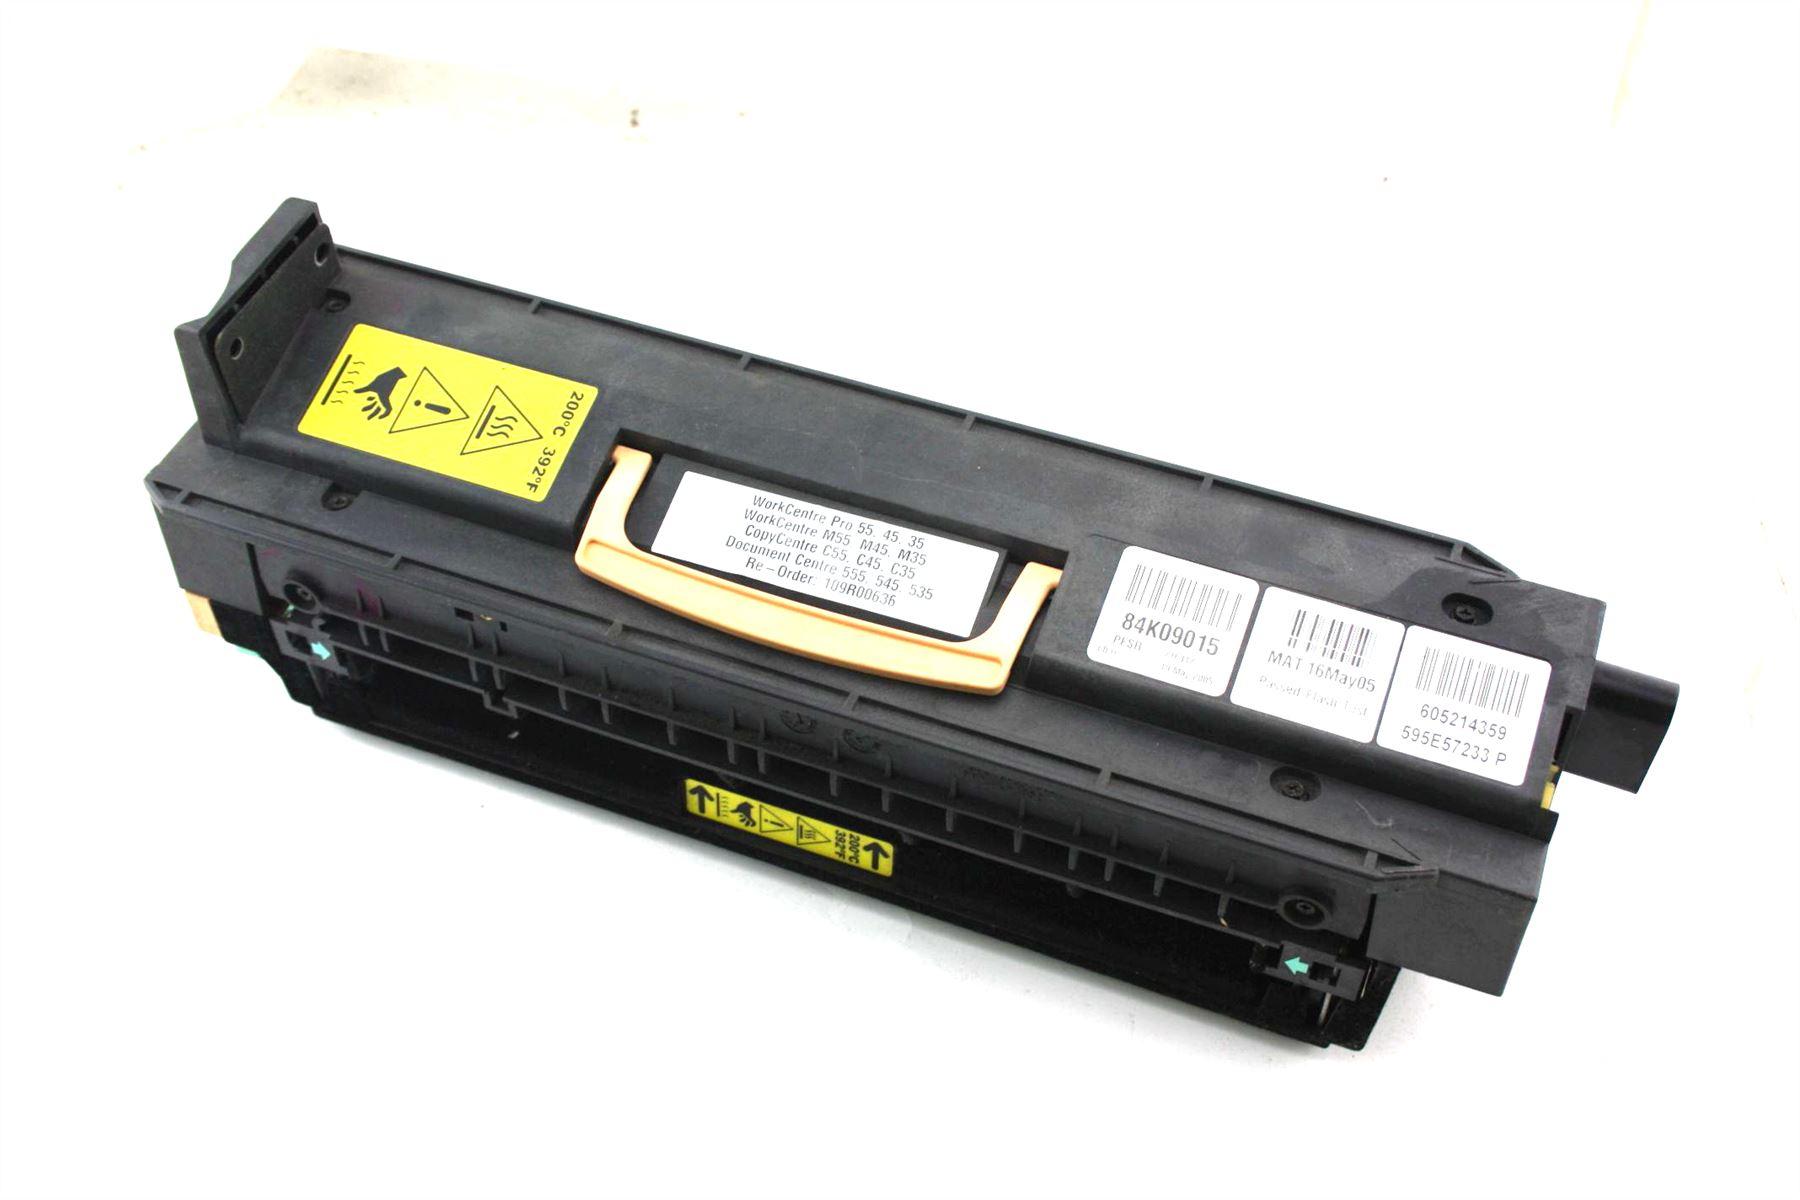 XEROX Printer WorkCentre Pro 545 Driver UPDATE